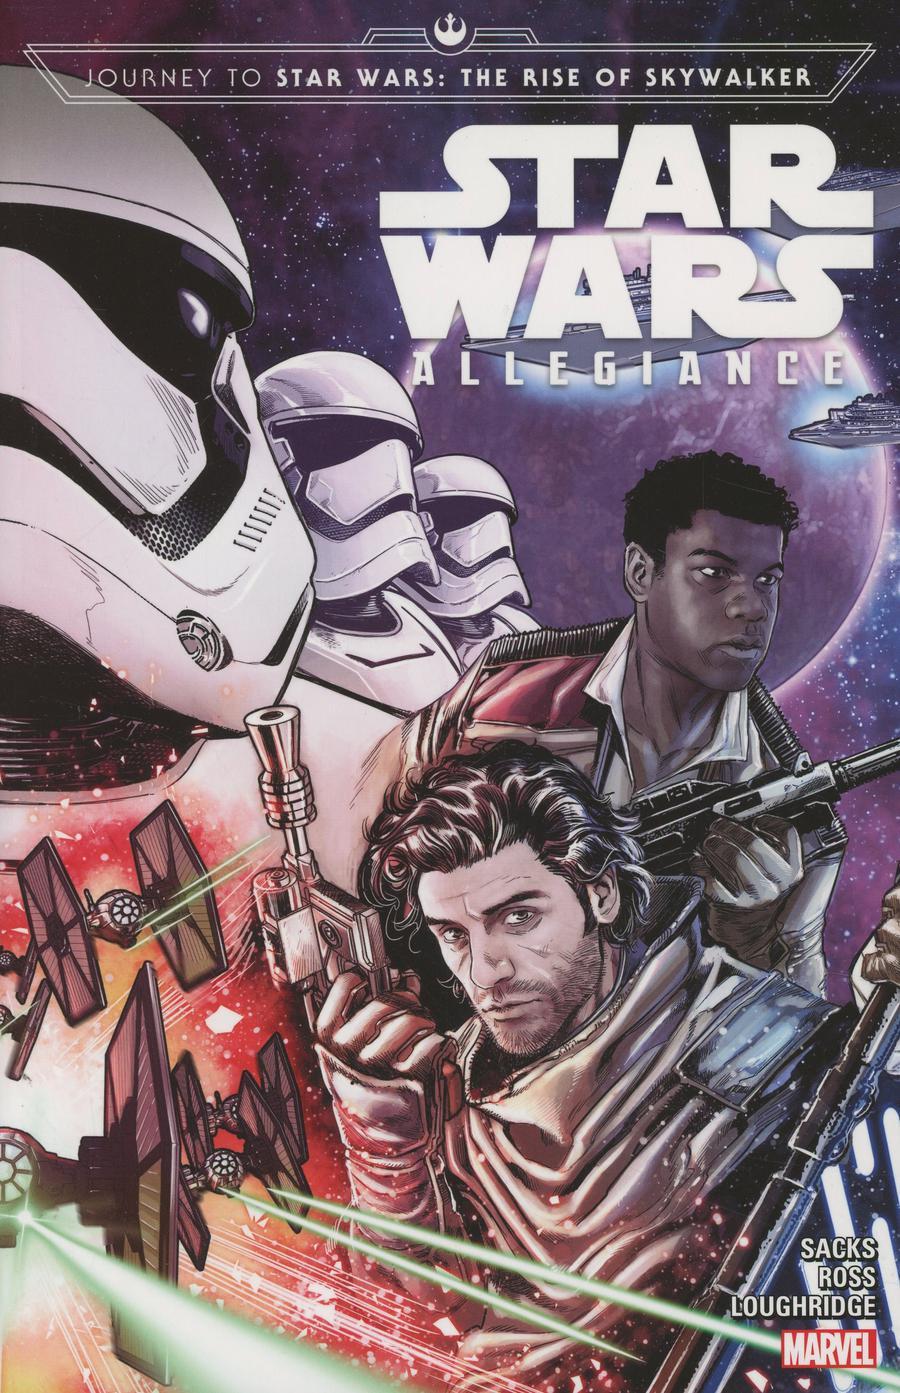 Journey To Star Wars Rise Of Skywalker Allegiance TP Direct Market Marco Checchetto Finn & Poe Variant Cover